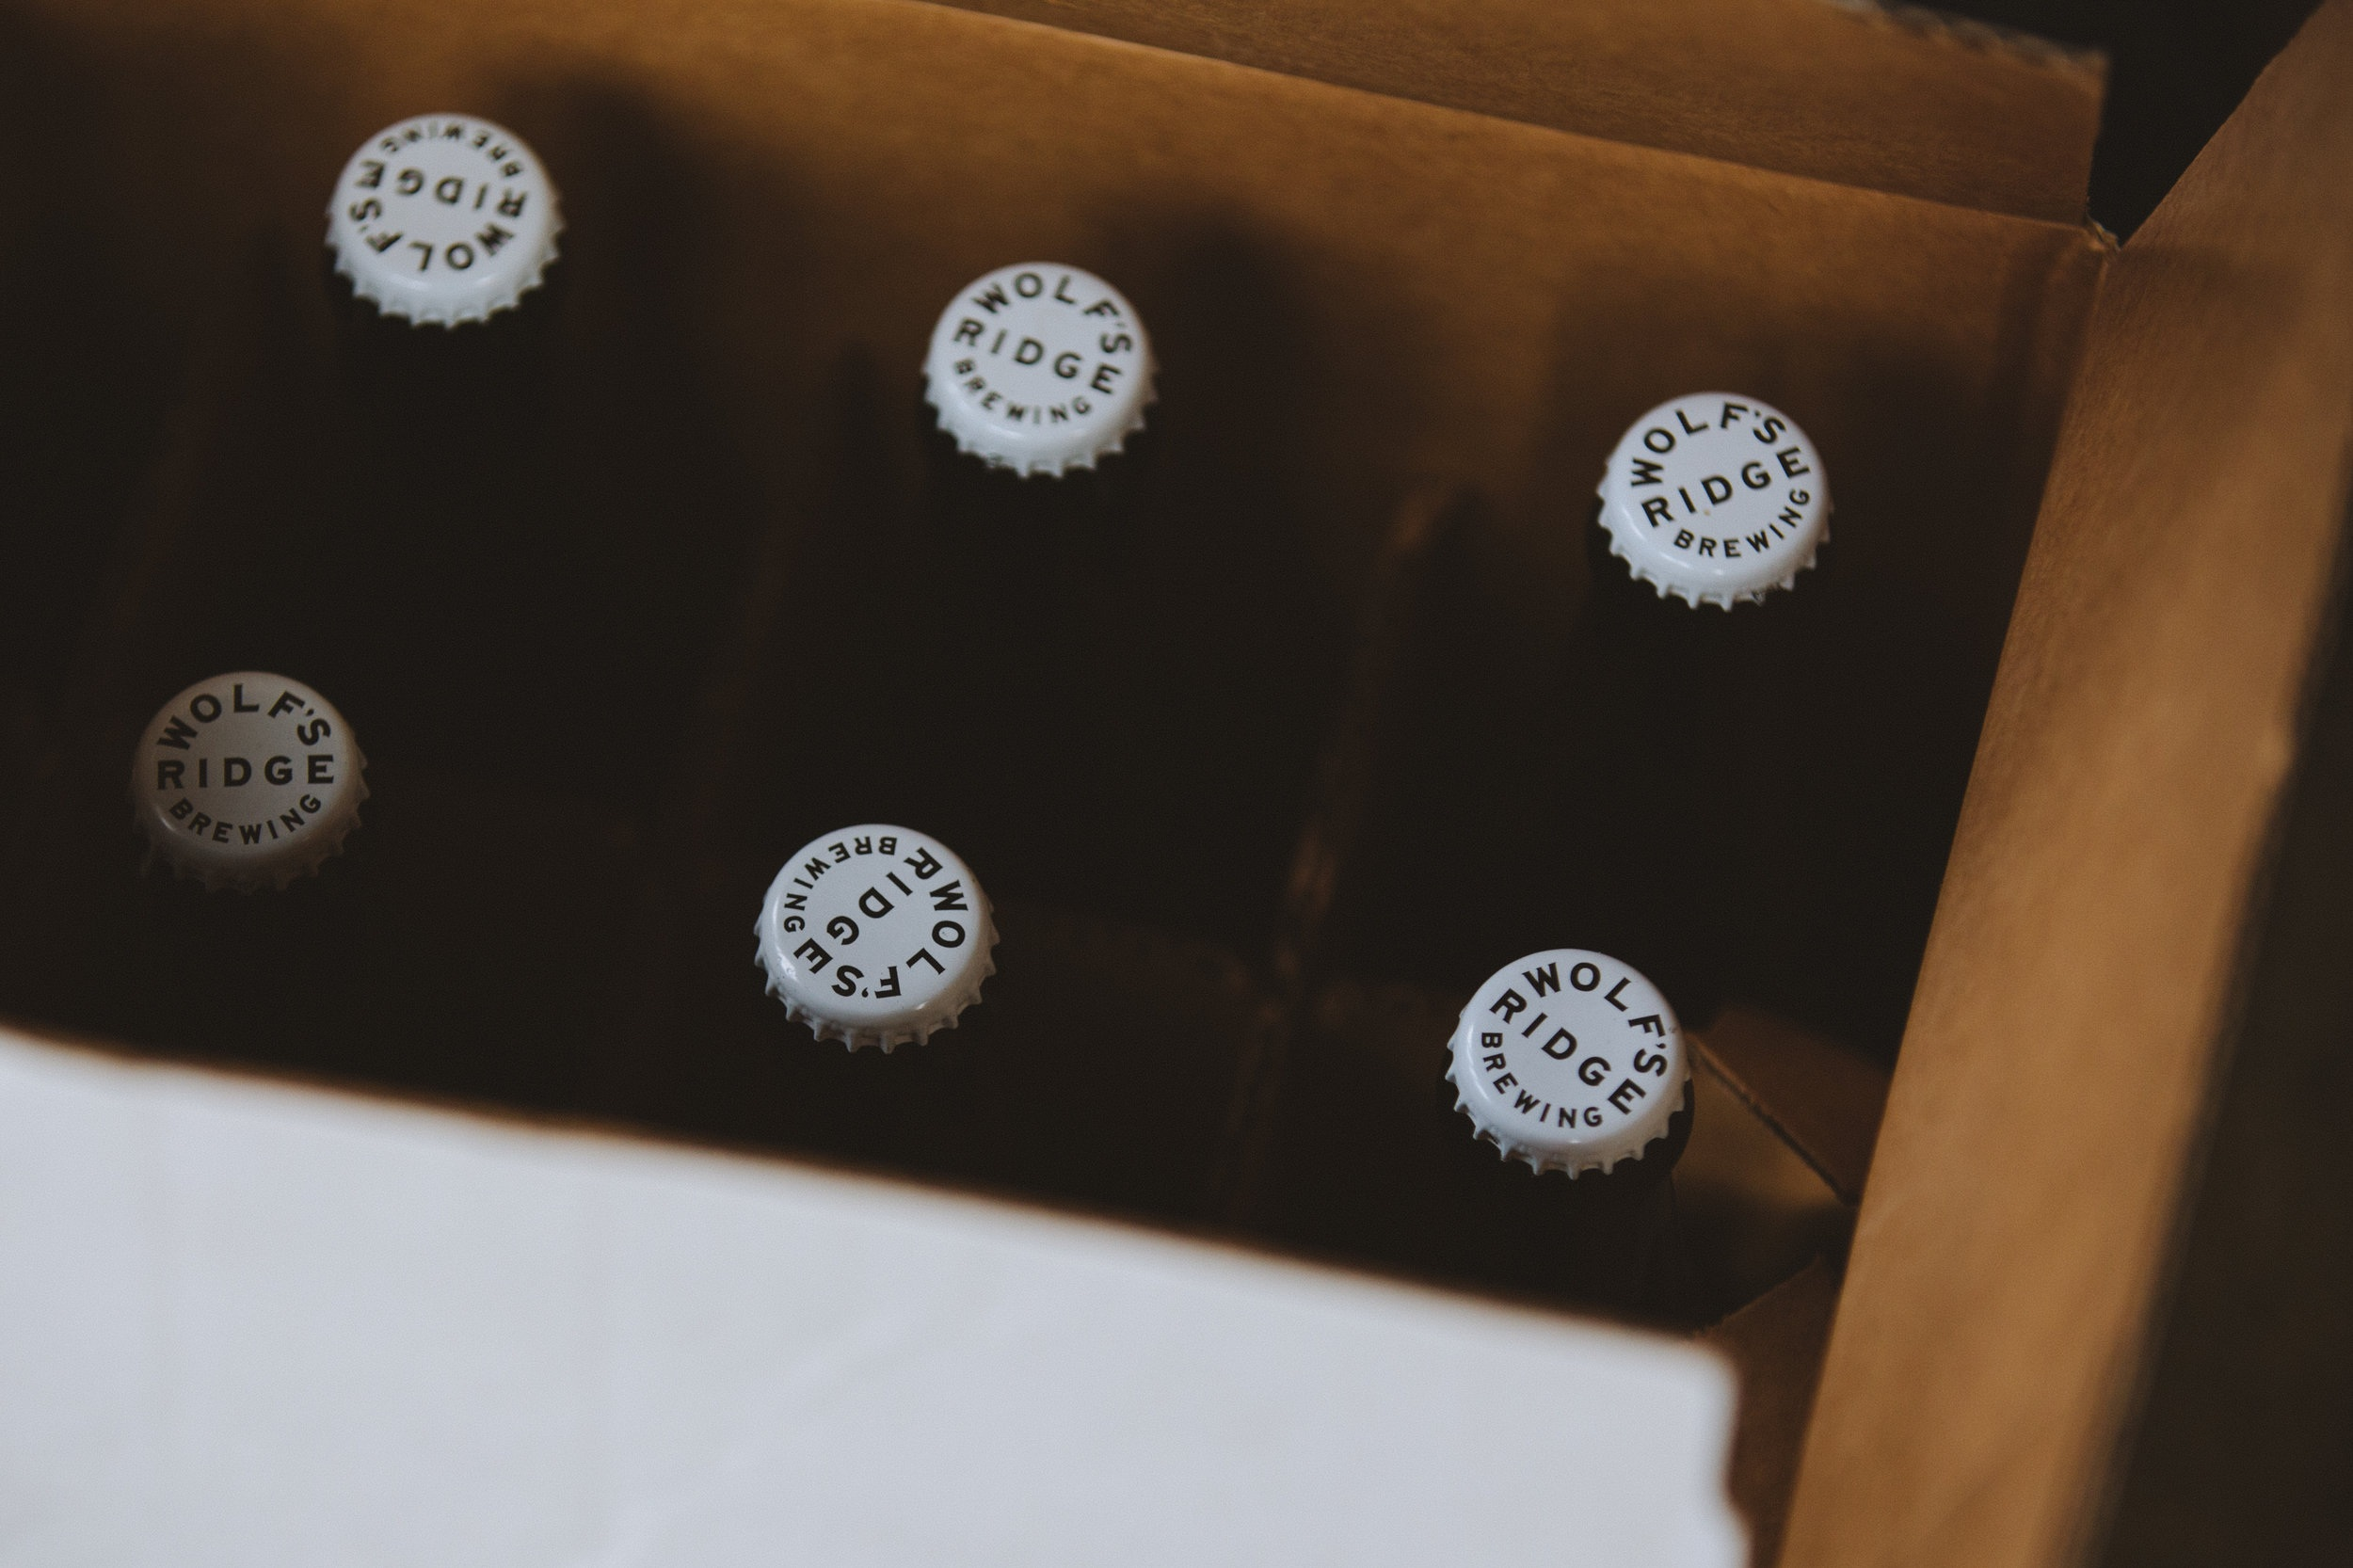 Bottle Reserve Perks - Learn more below!